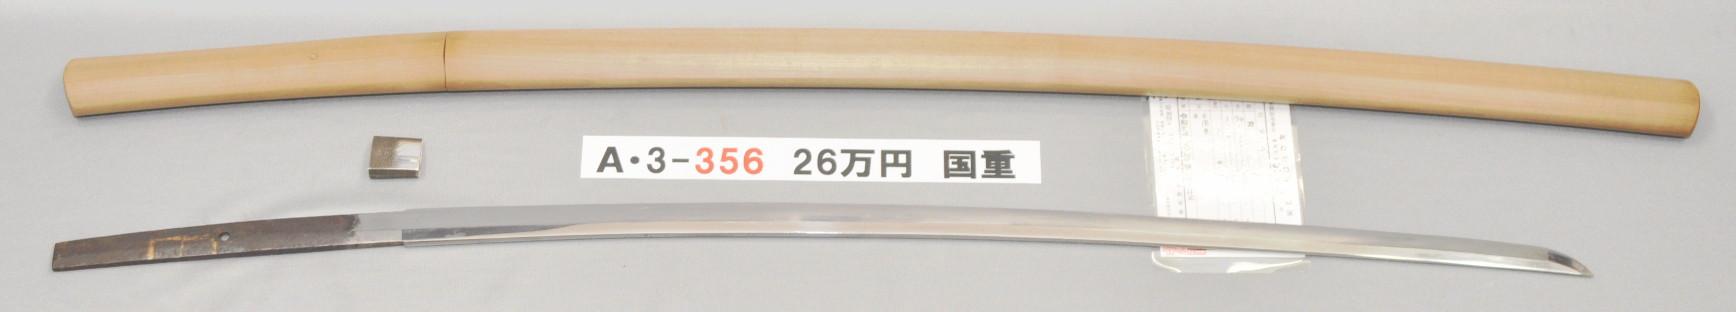 A3356